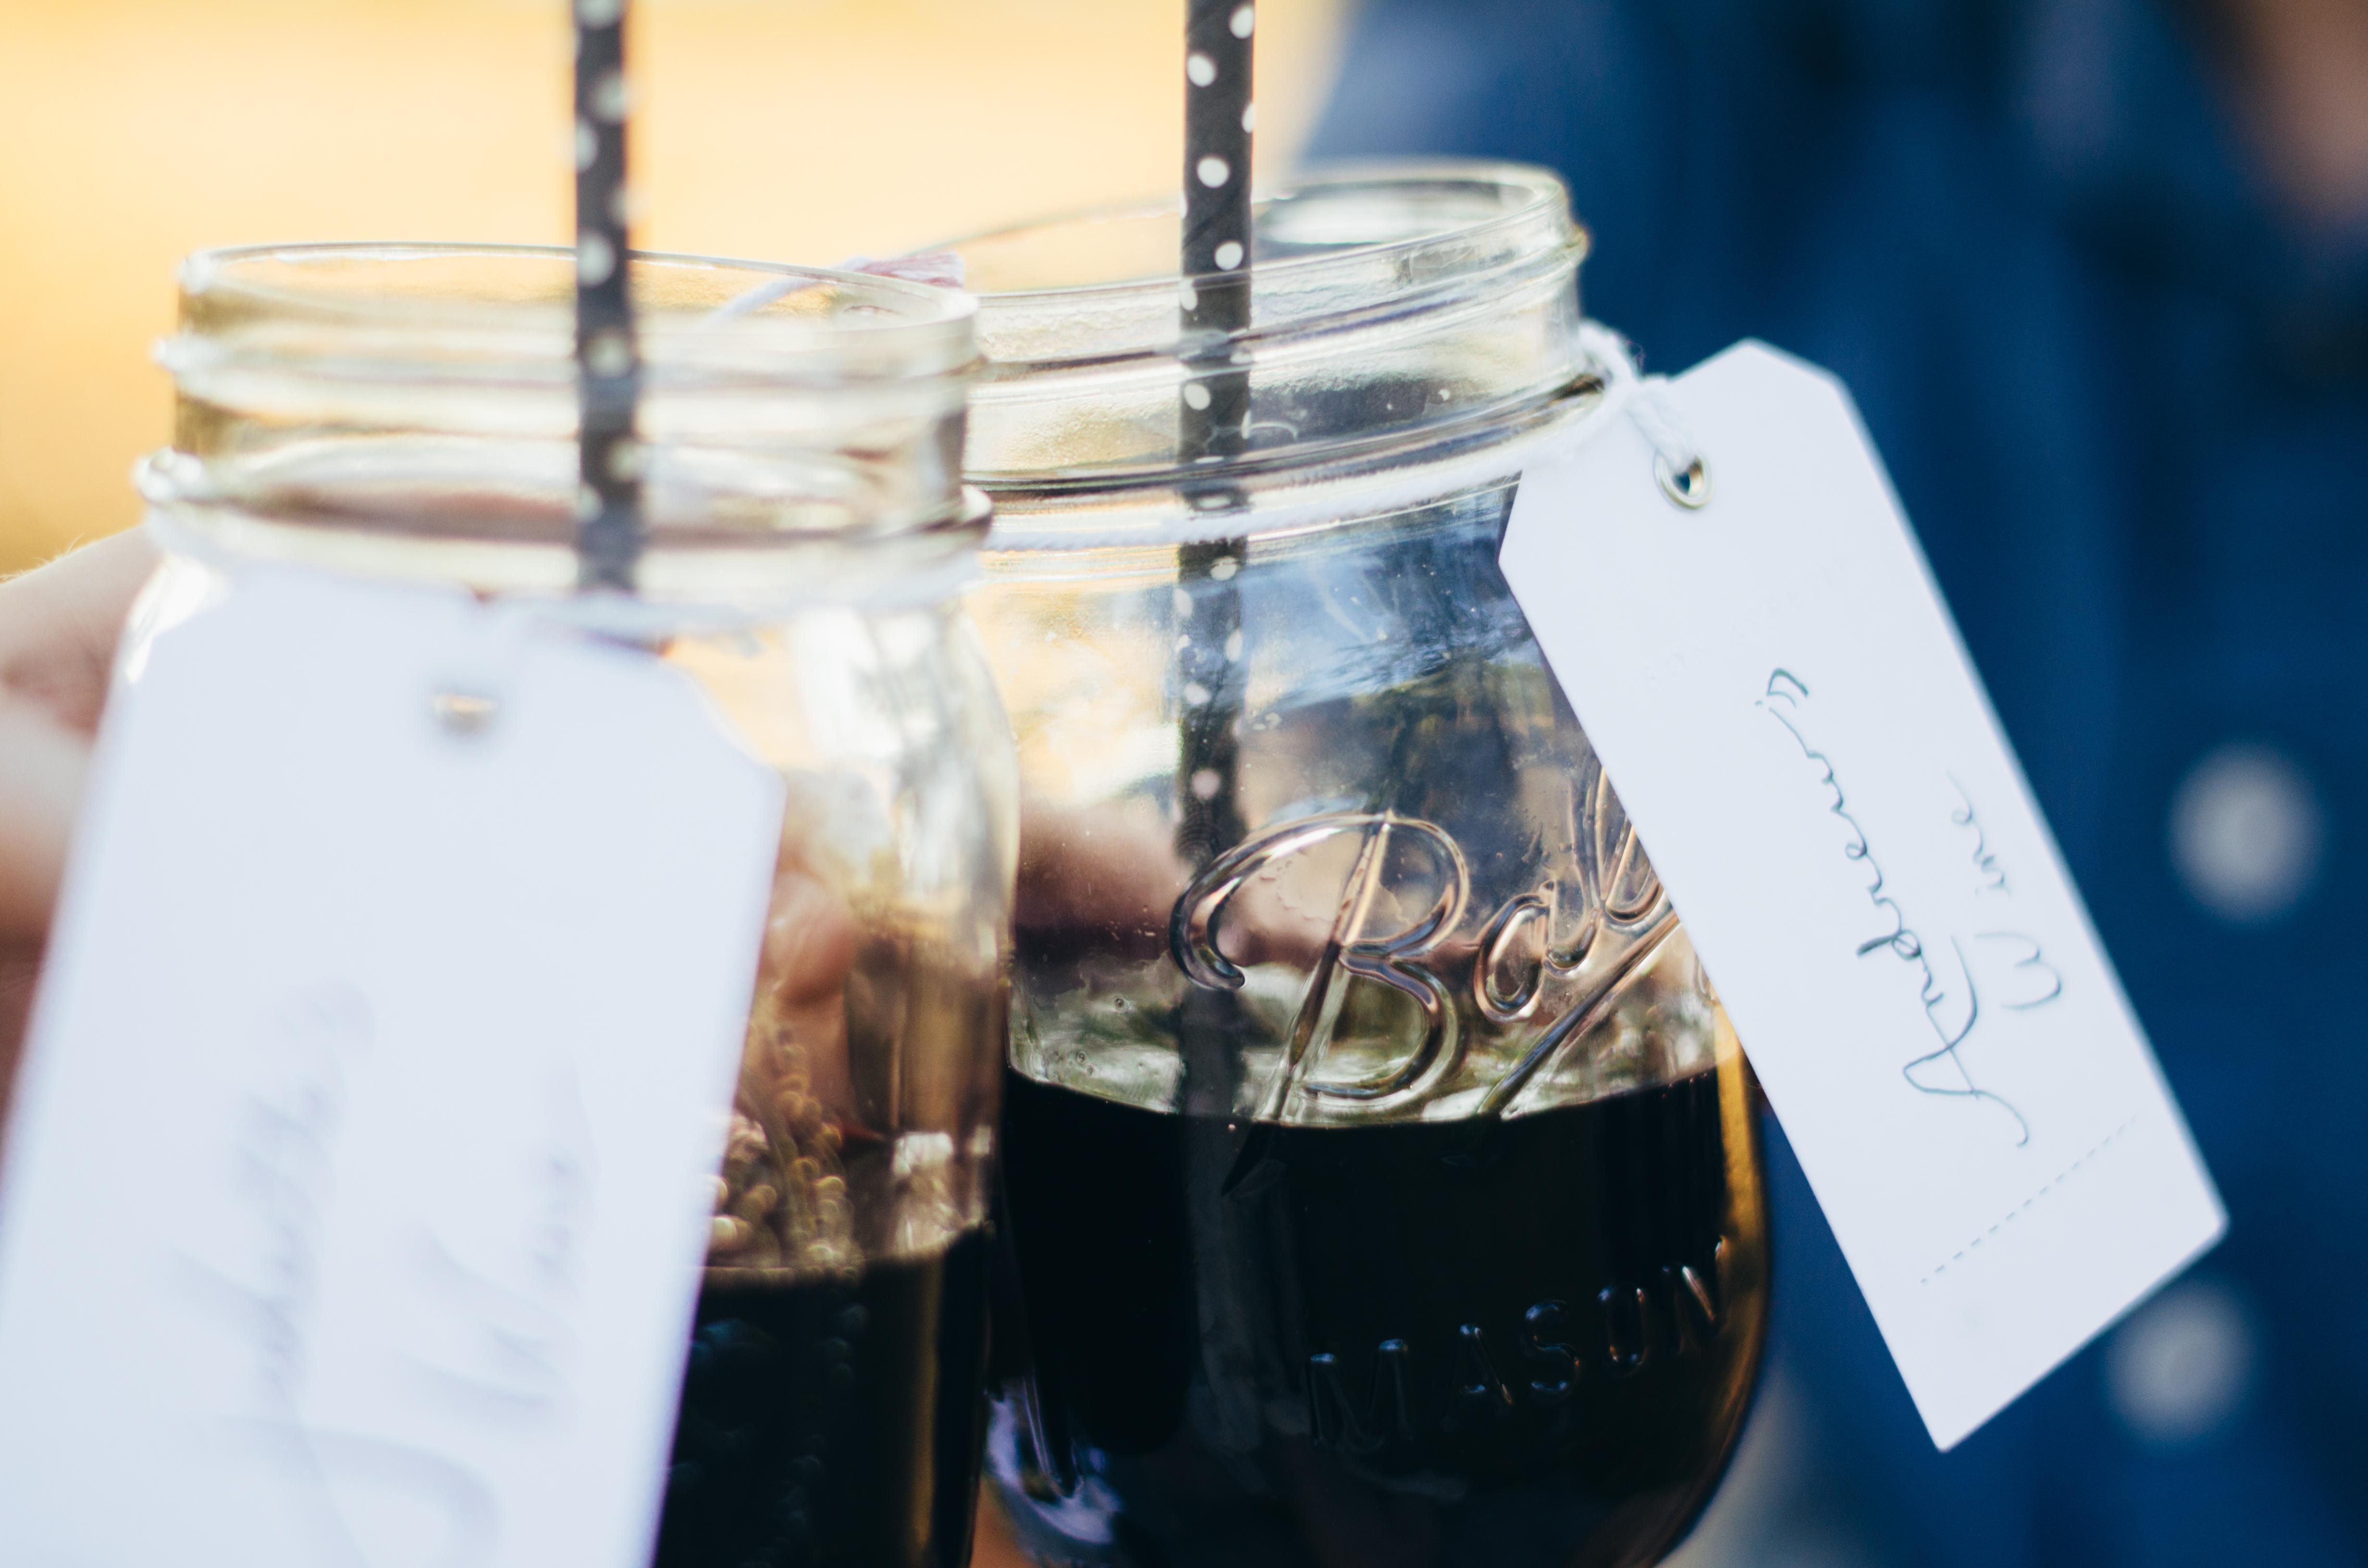 Cheers! Personalized mason jar wine glasses on juliettelaura.blogspot.com